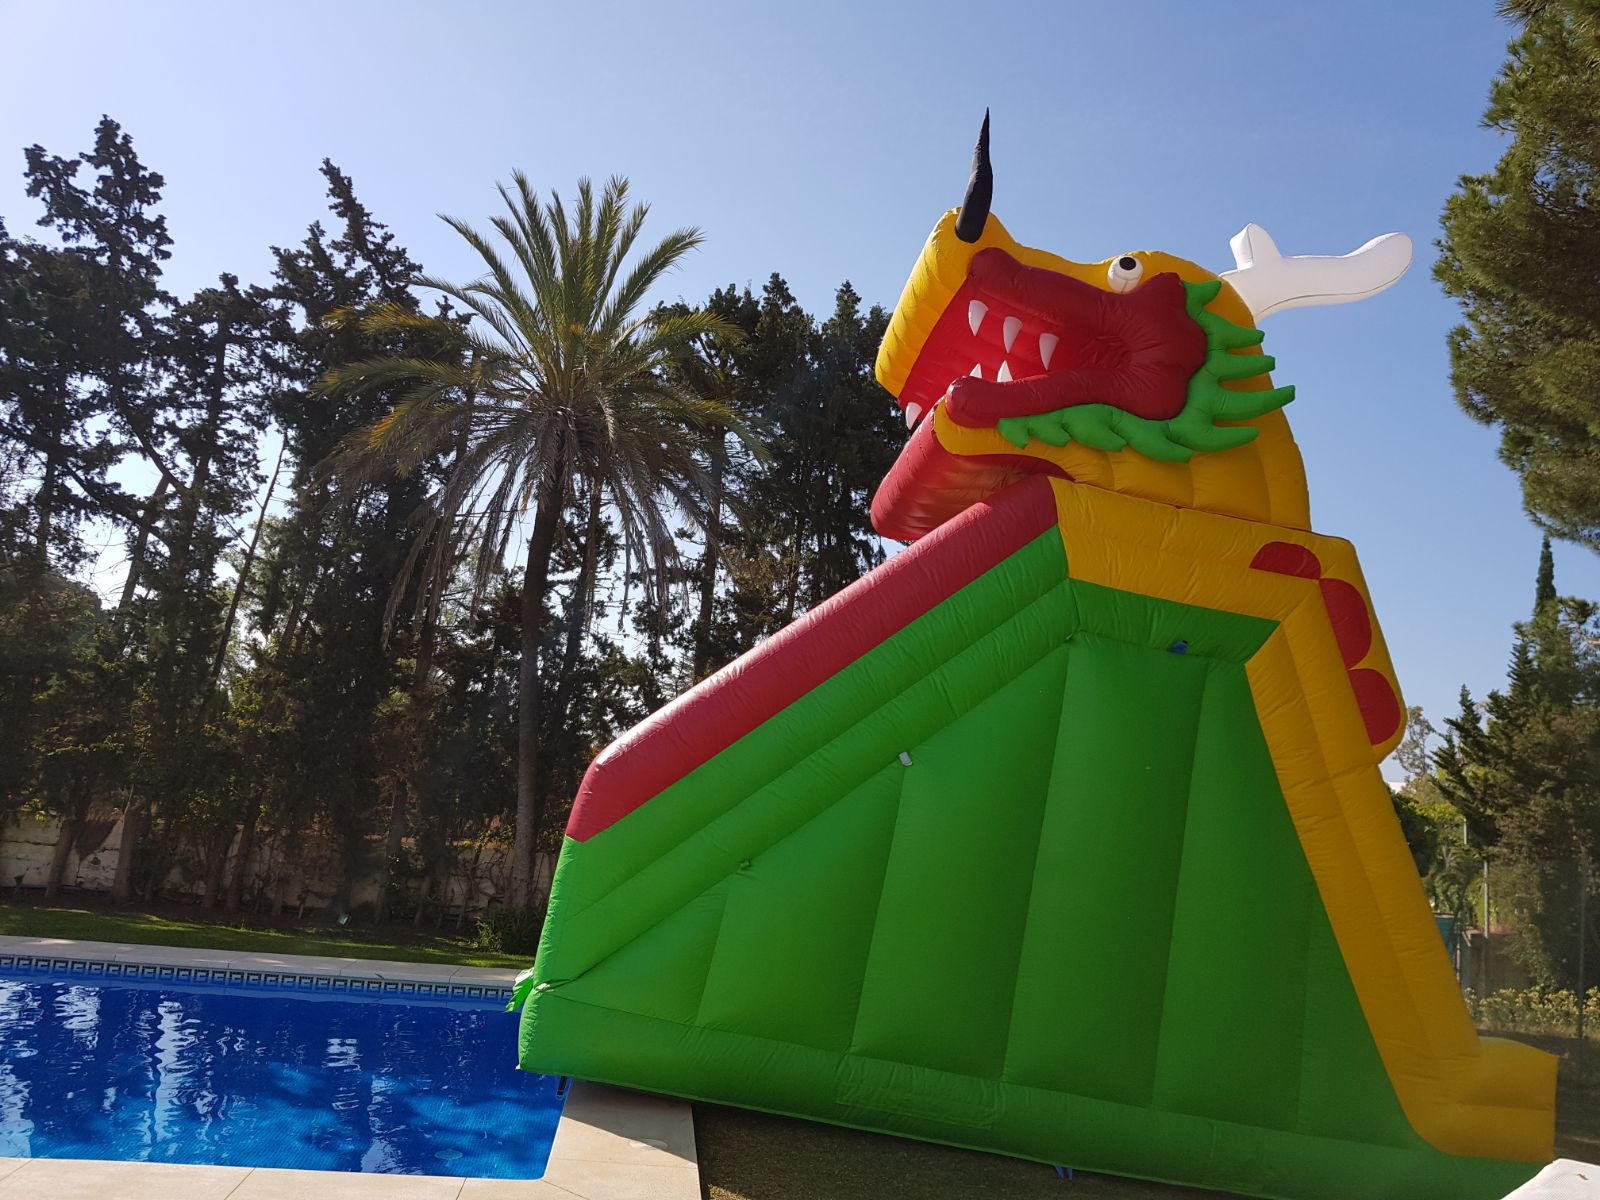 Alquiler castillo hinchable Málaga